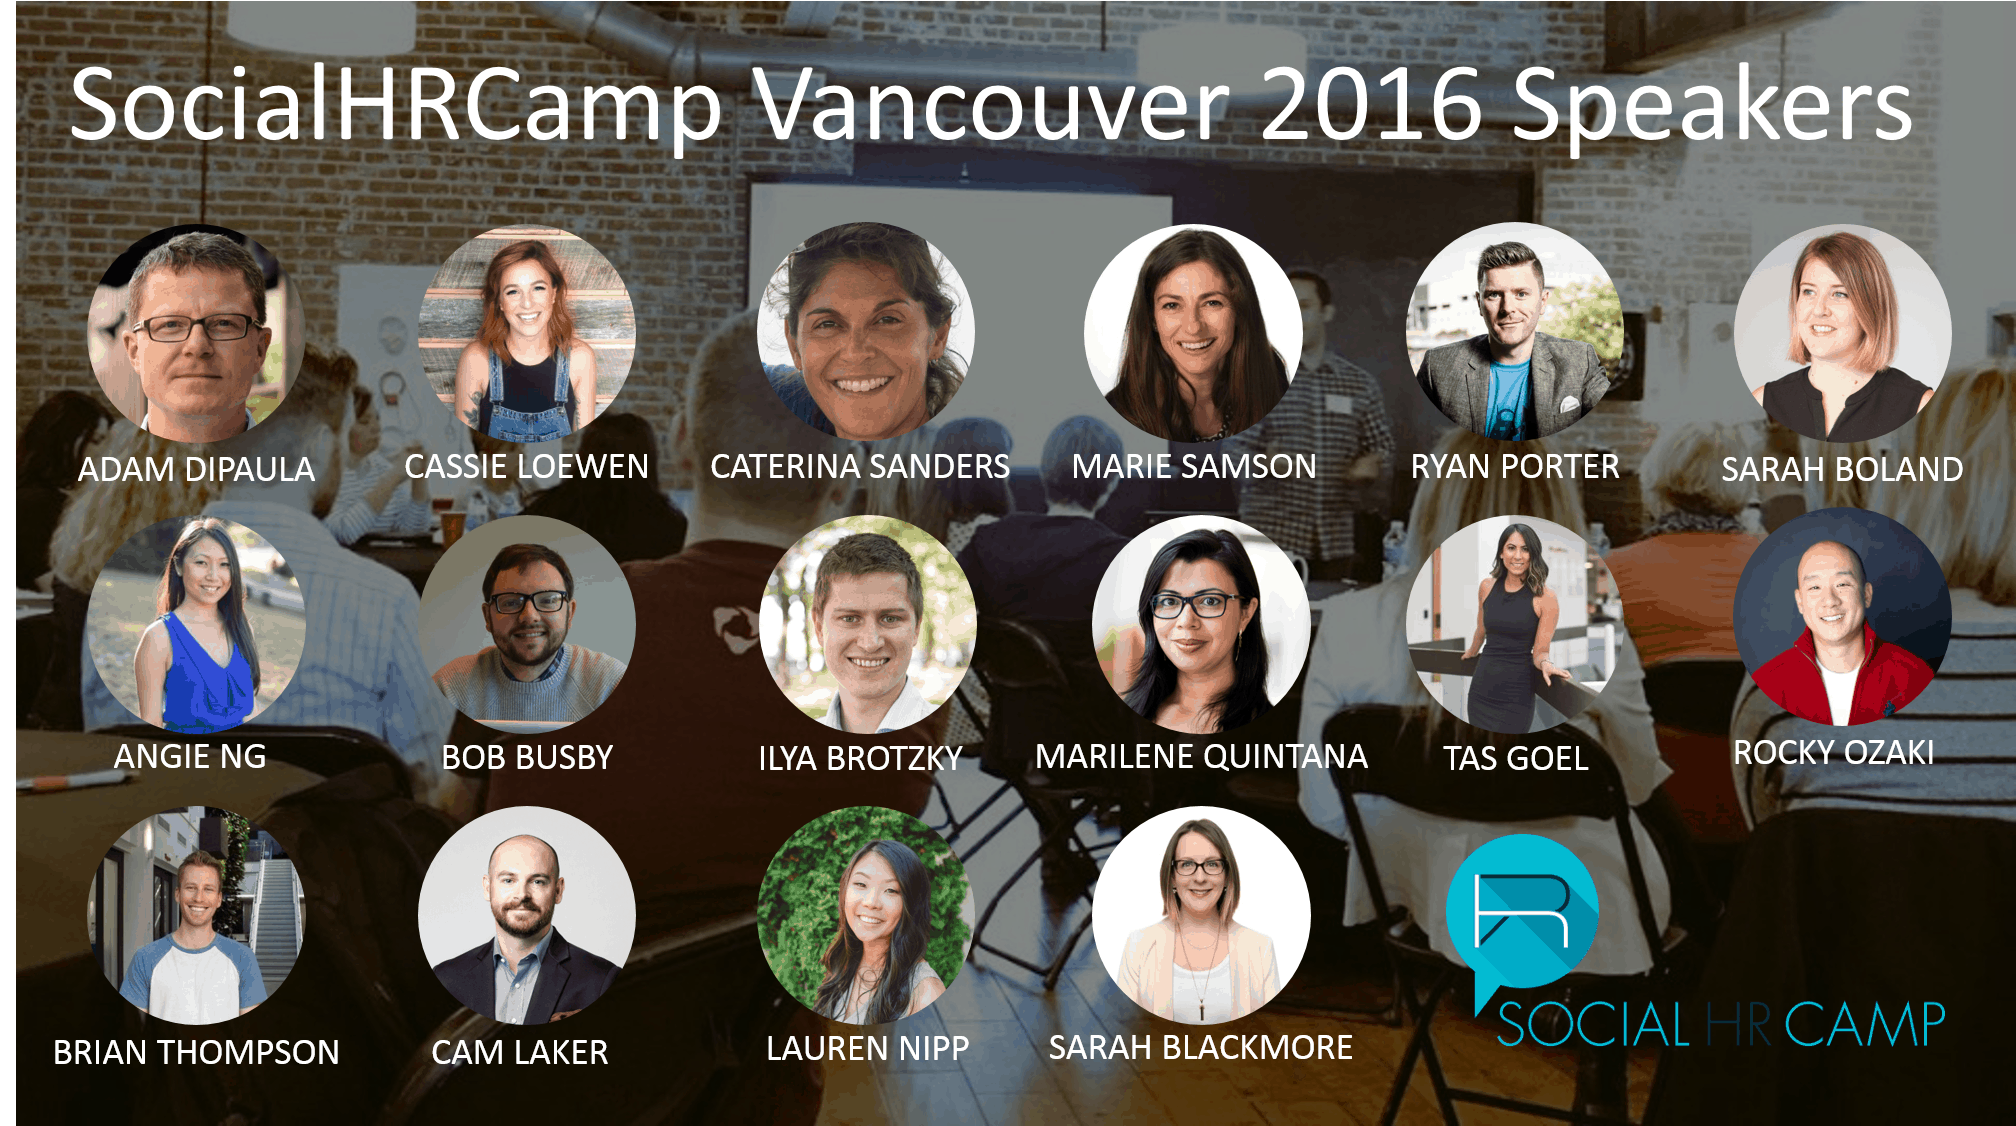 SocialHRCamp Vancouver 2016 Speakers SHRC16